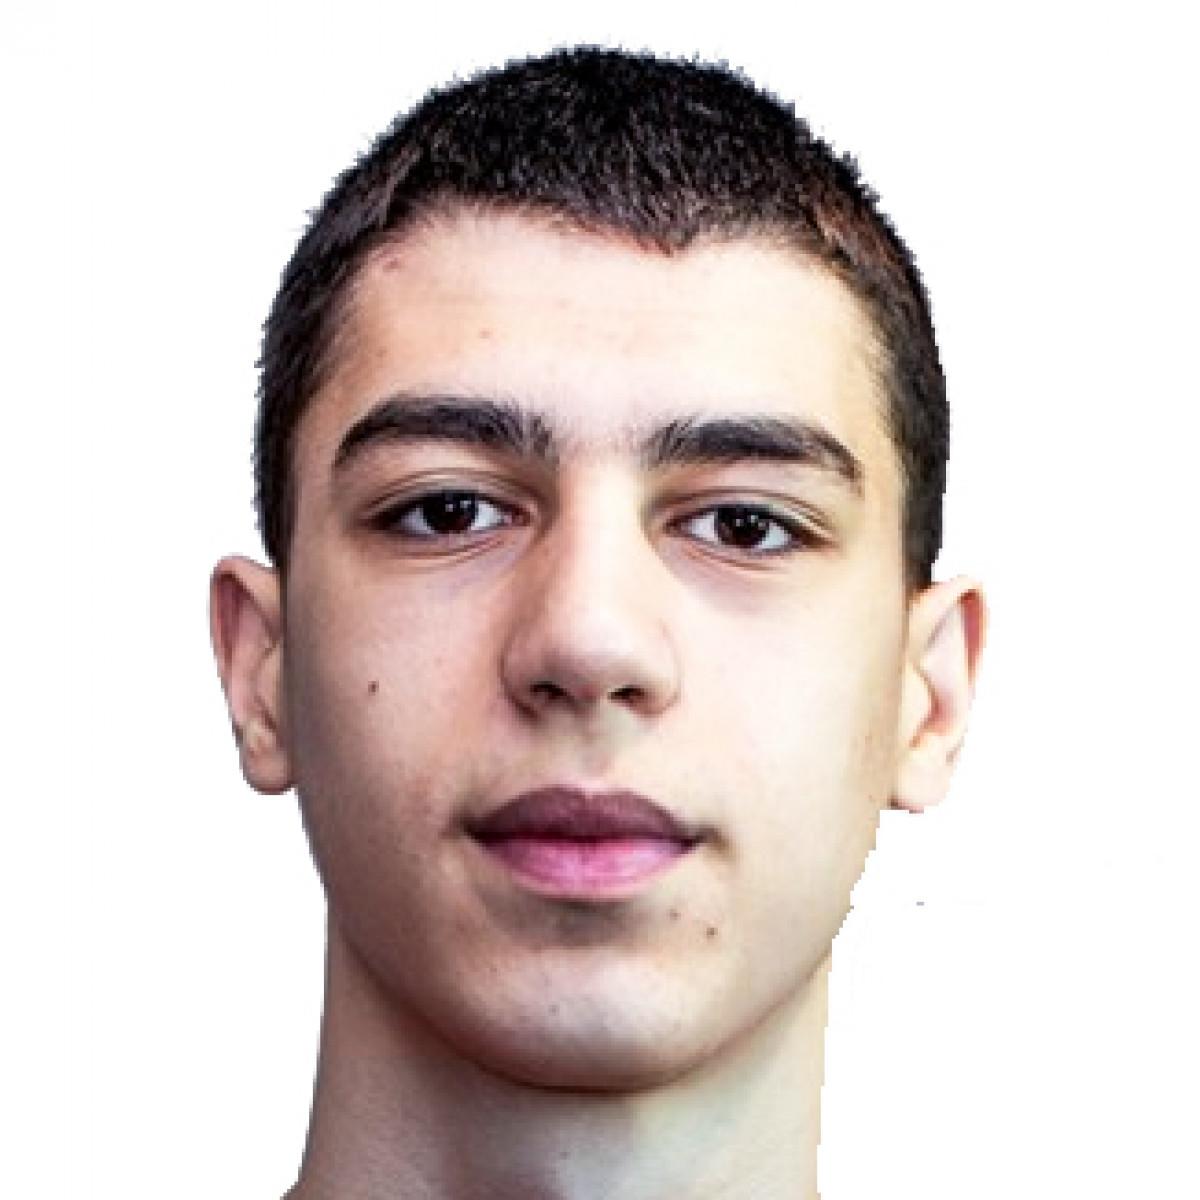 Andrija   Grbovic